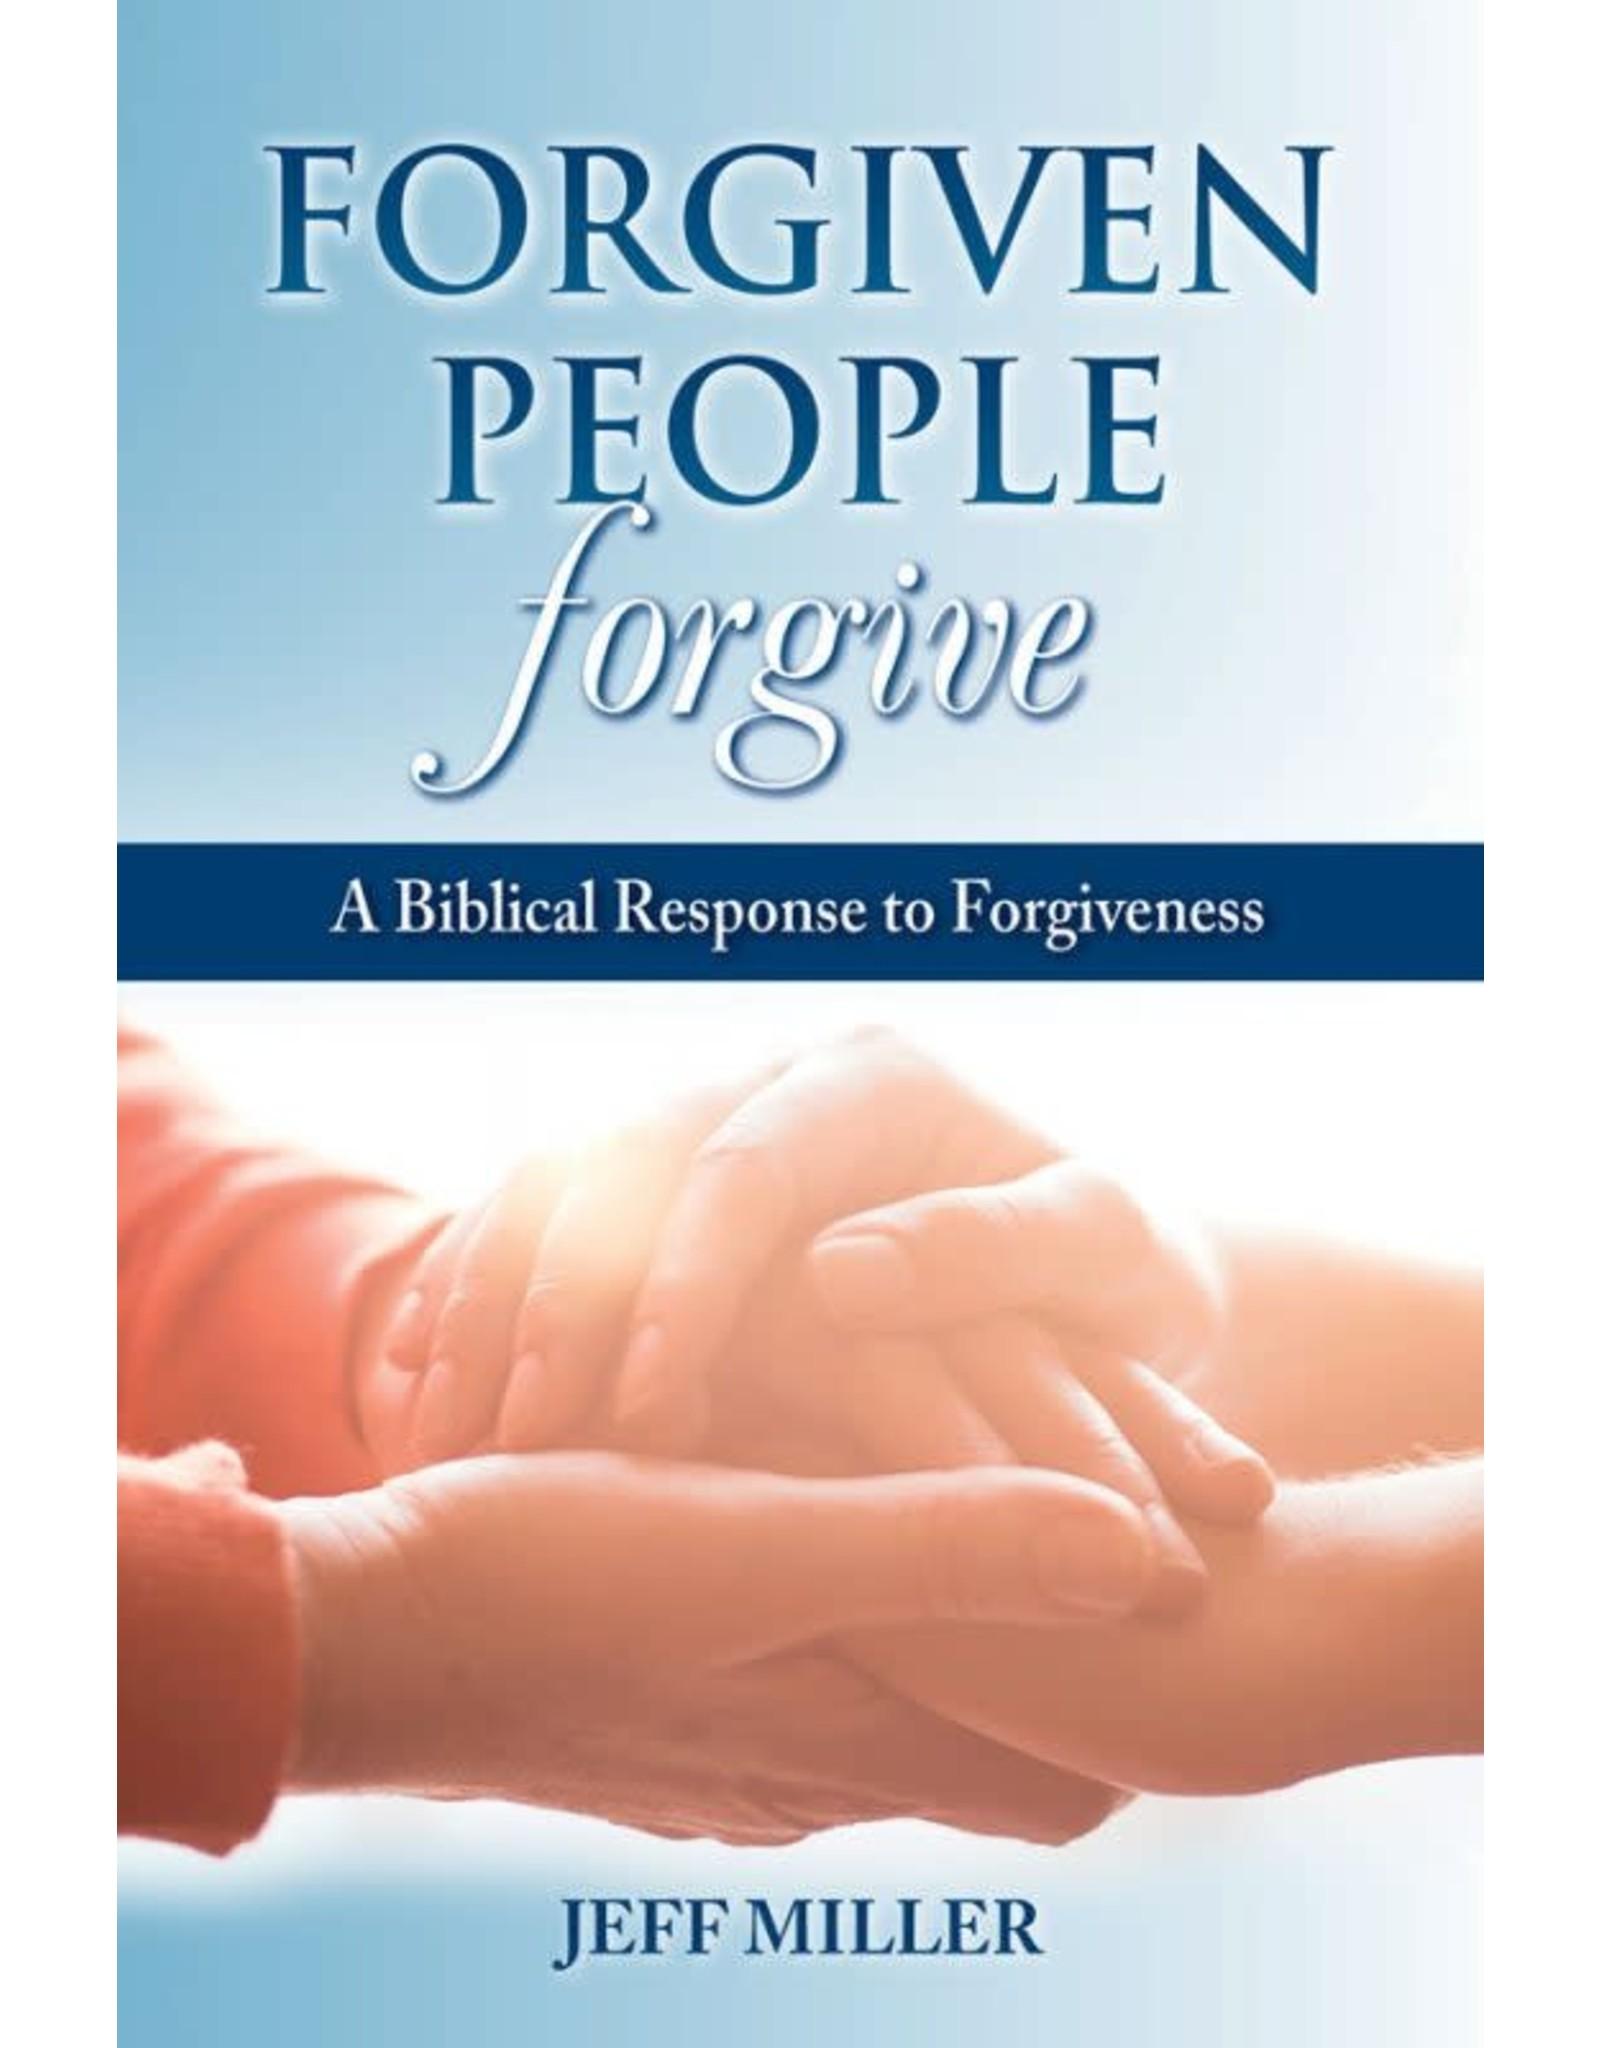 Focus Publishing Forgiven People Forgive: A Biblical Response